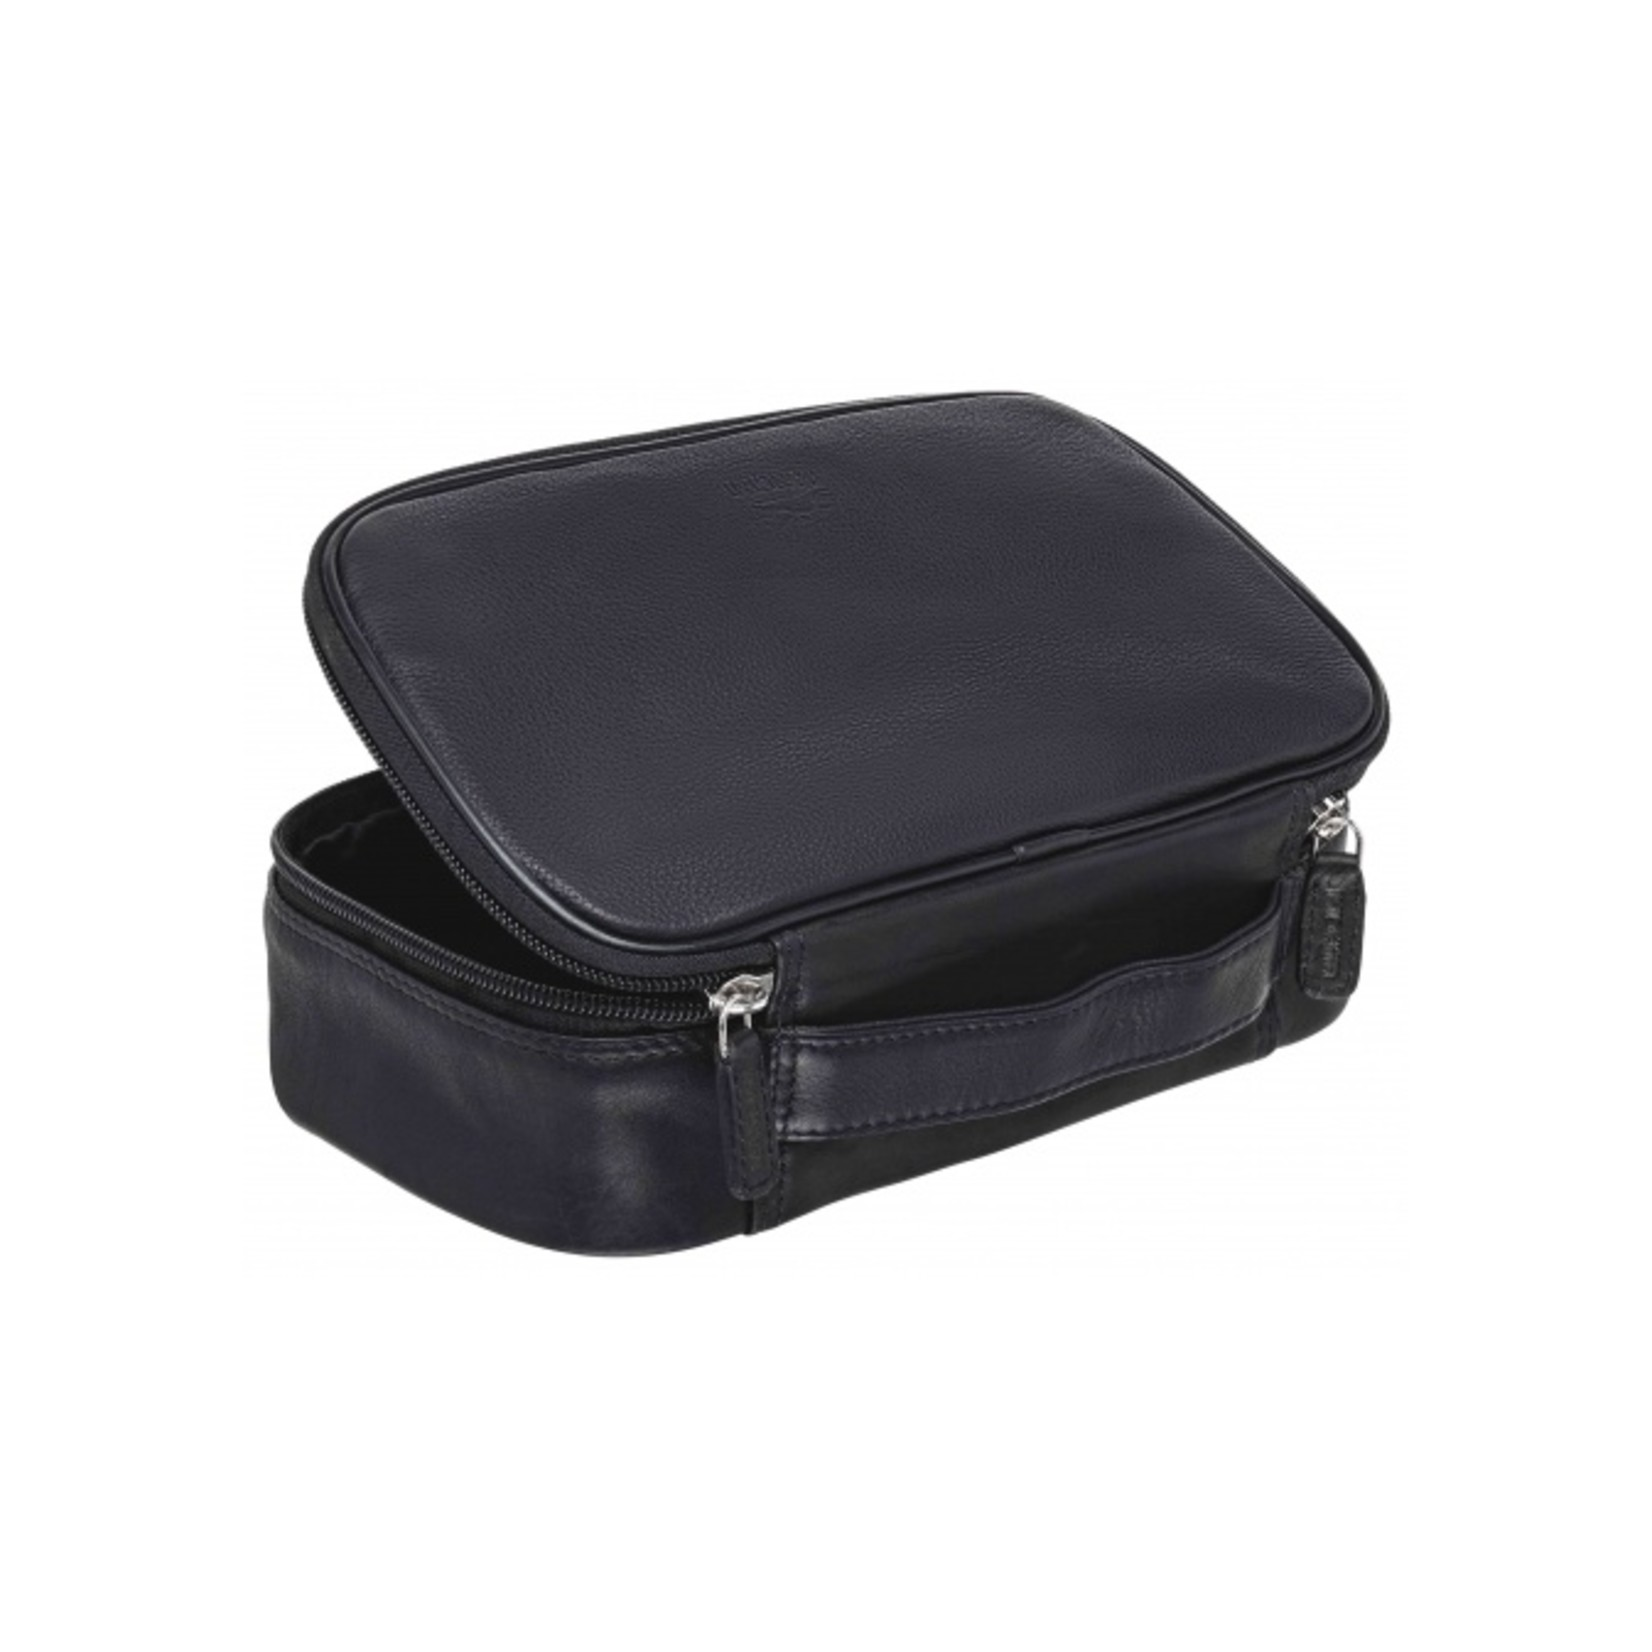 Mancini Mancini 98897 Medium Zippered Toiletry Bag